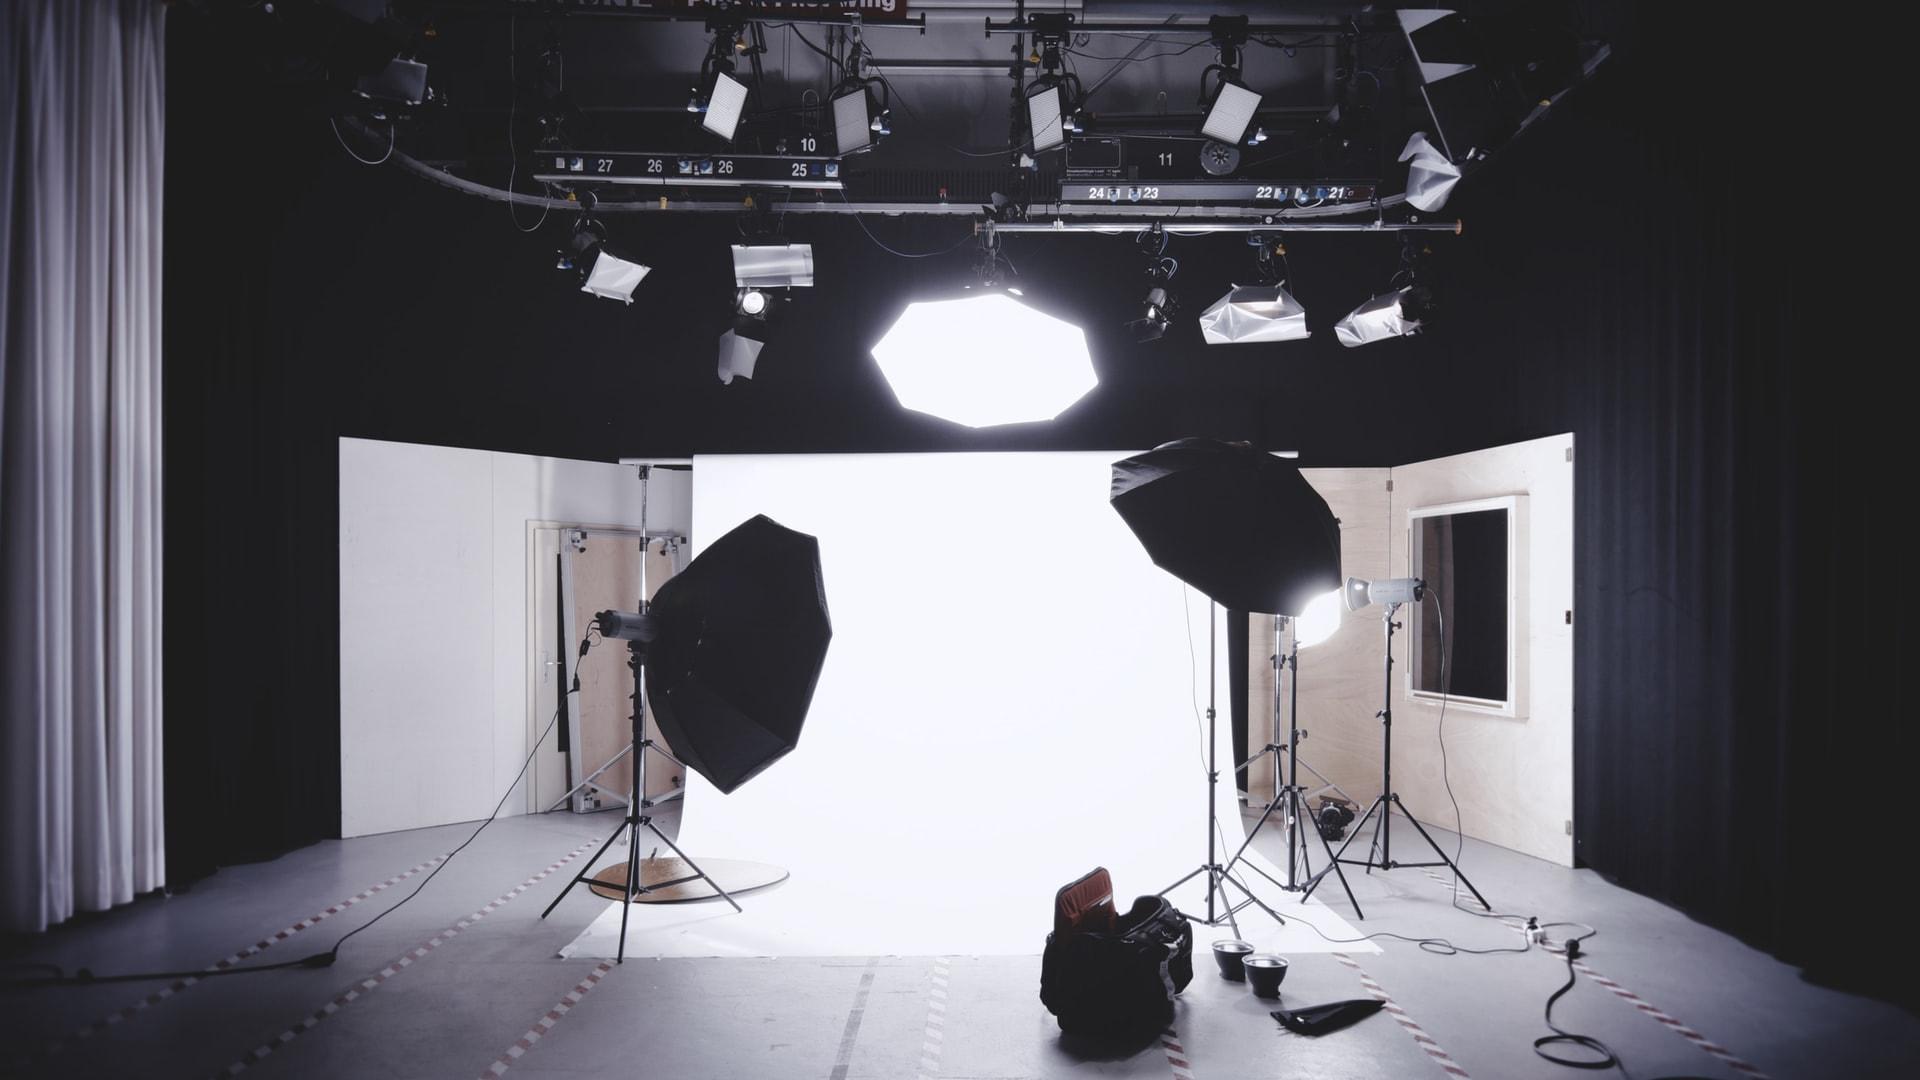 фотосессия онлайн баннер